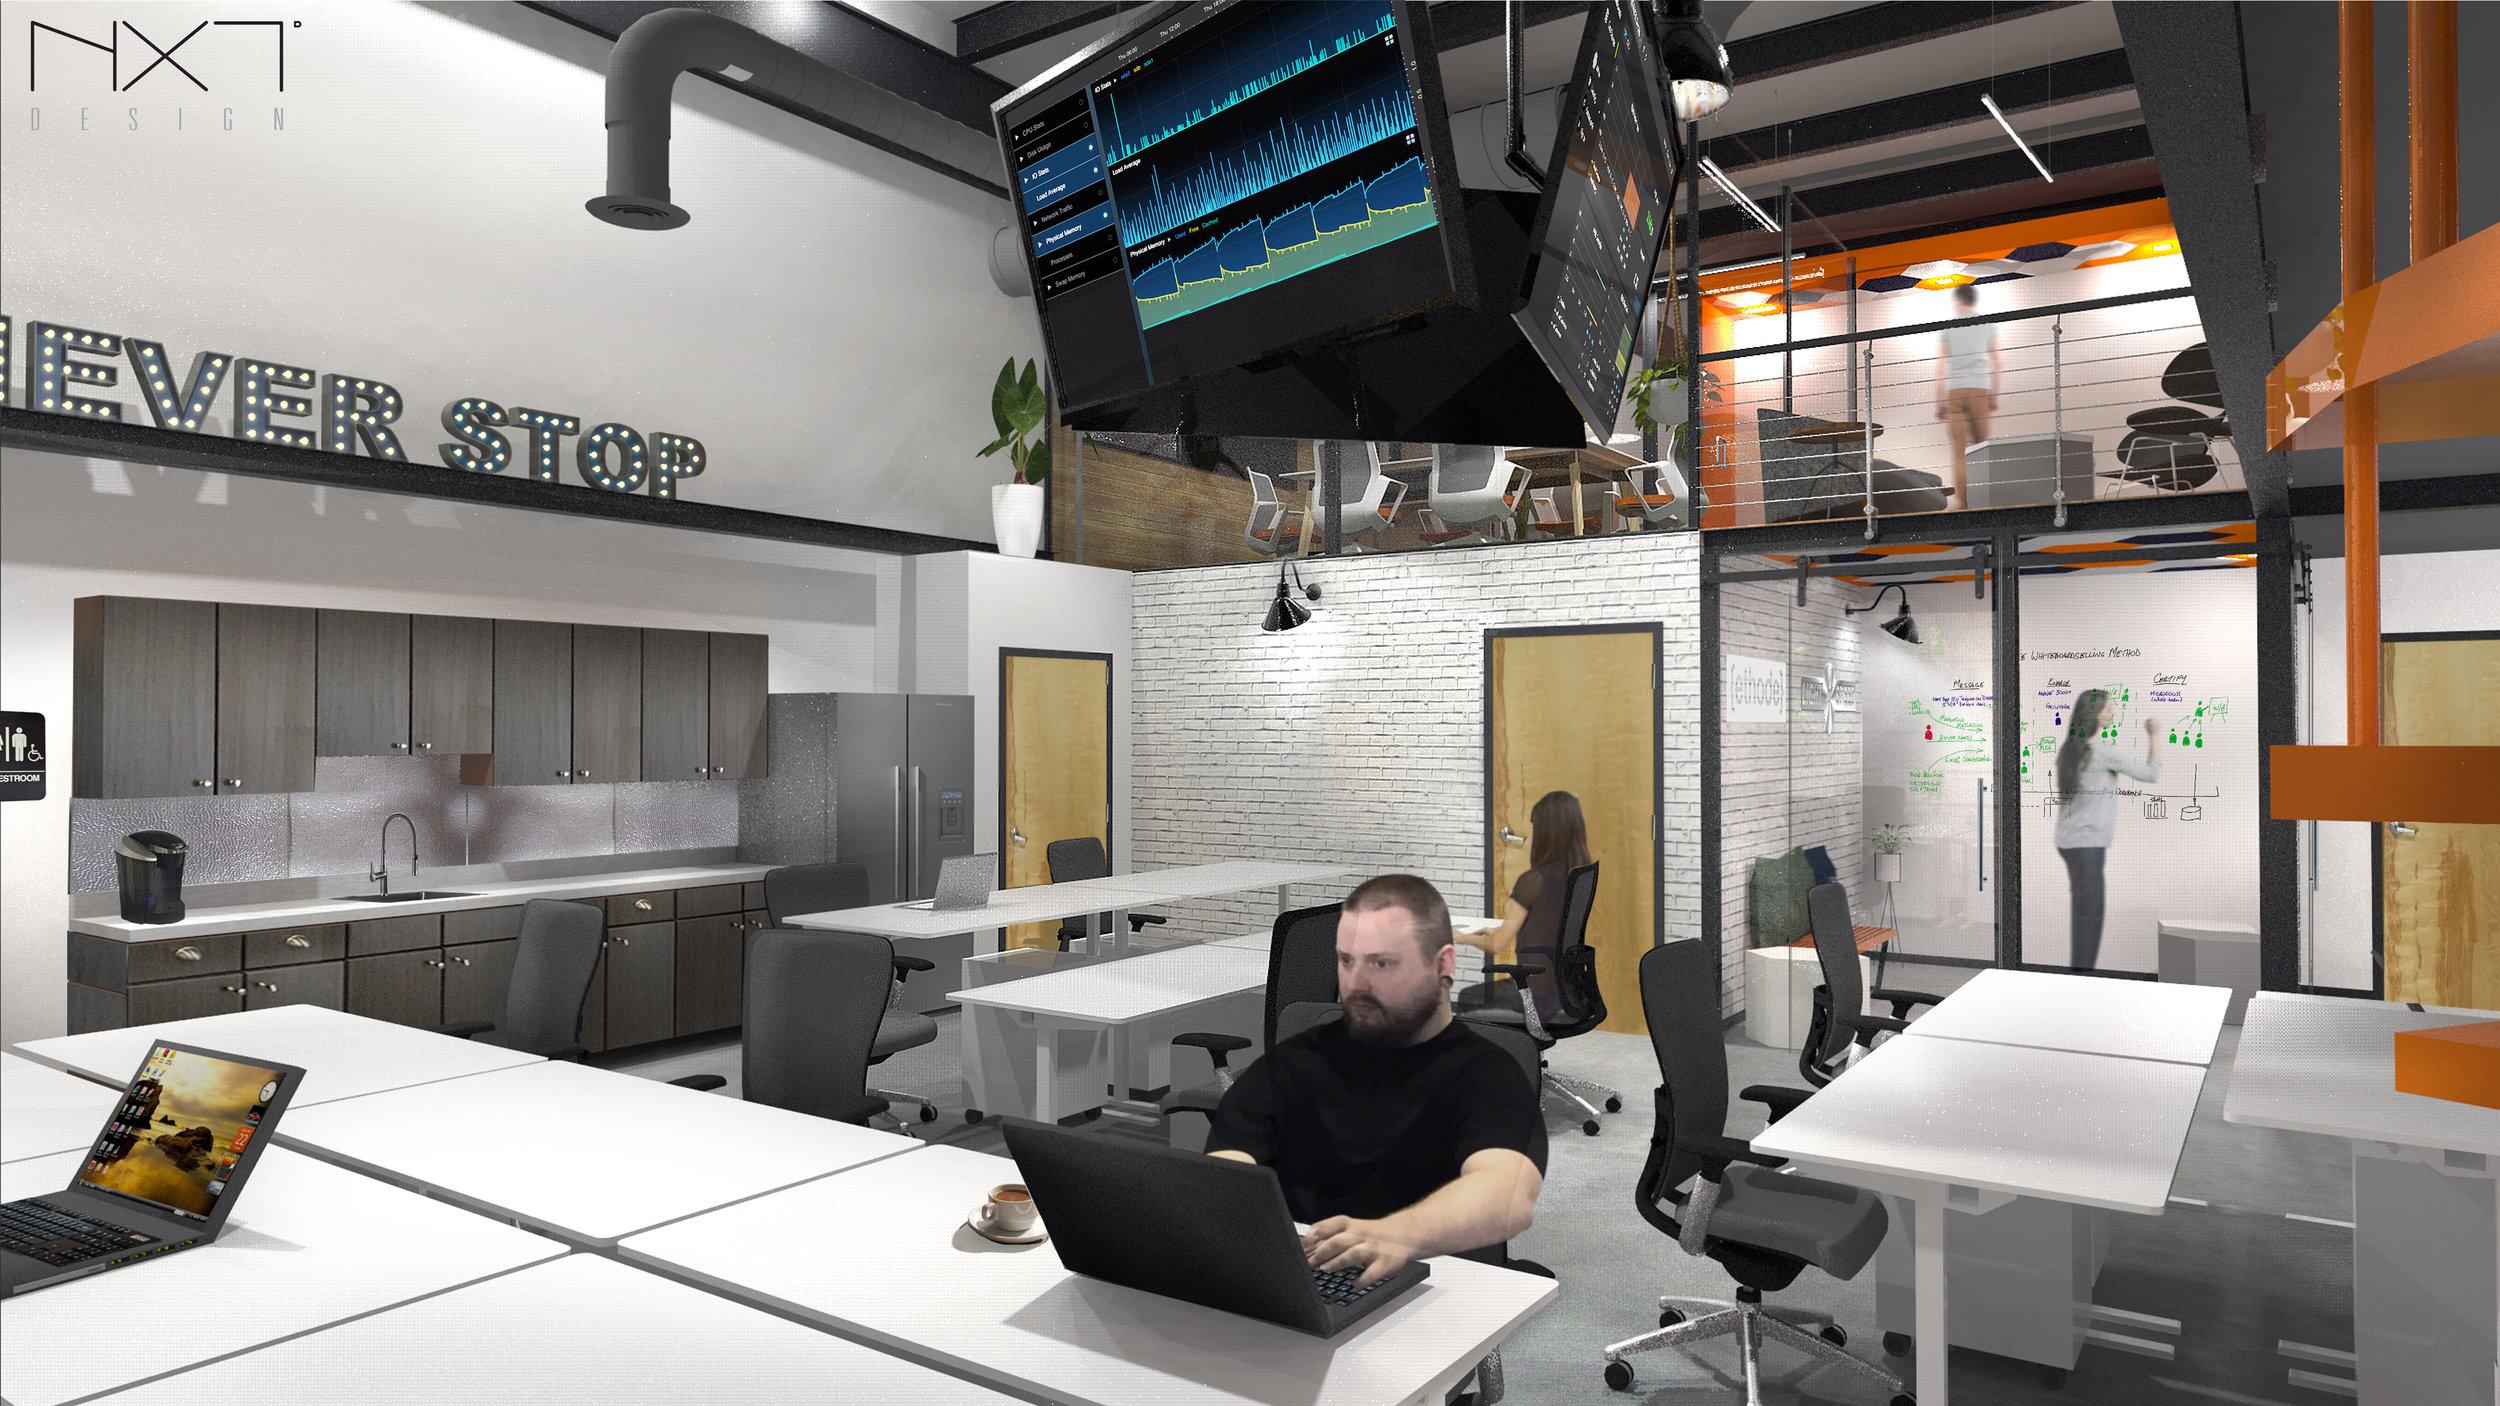 Ethode_creative_industrial_office_design.jpg